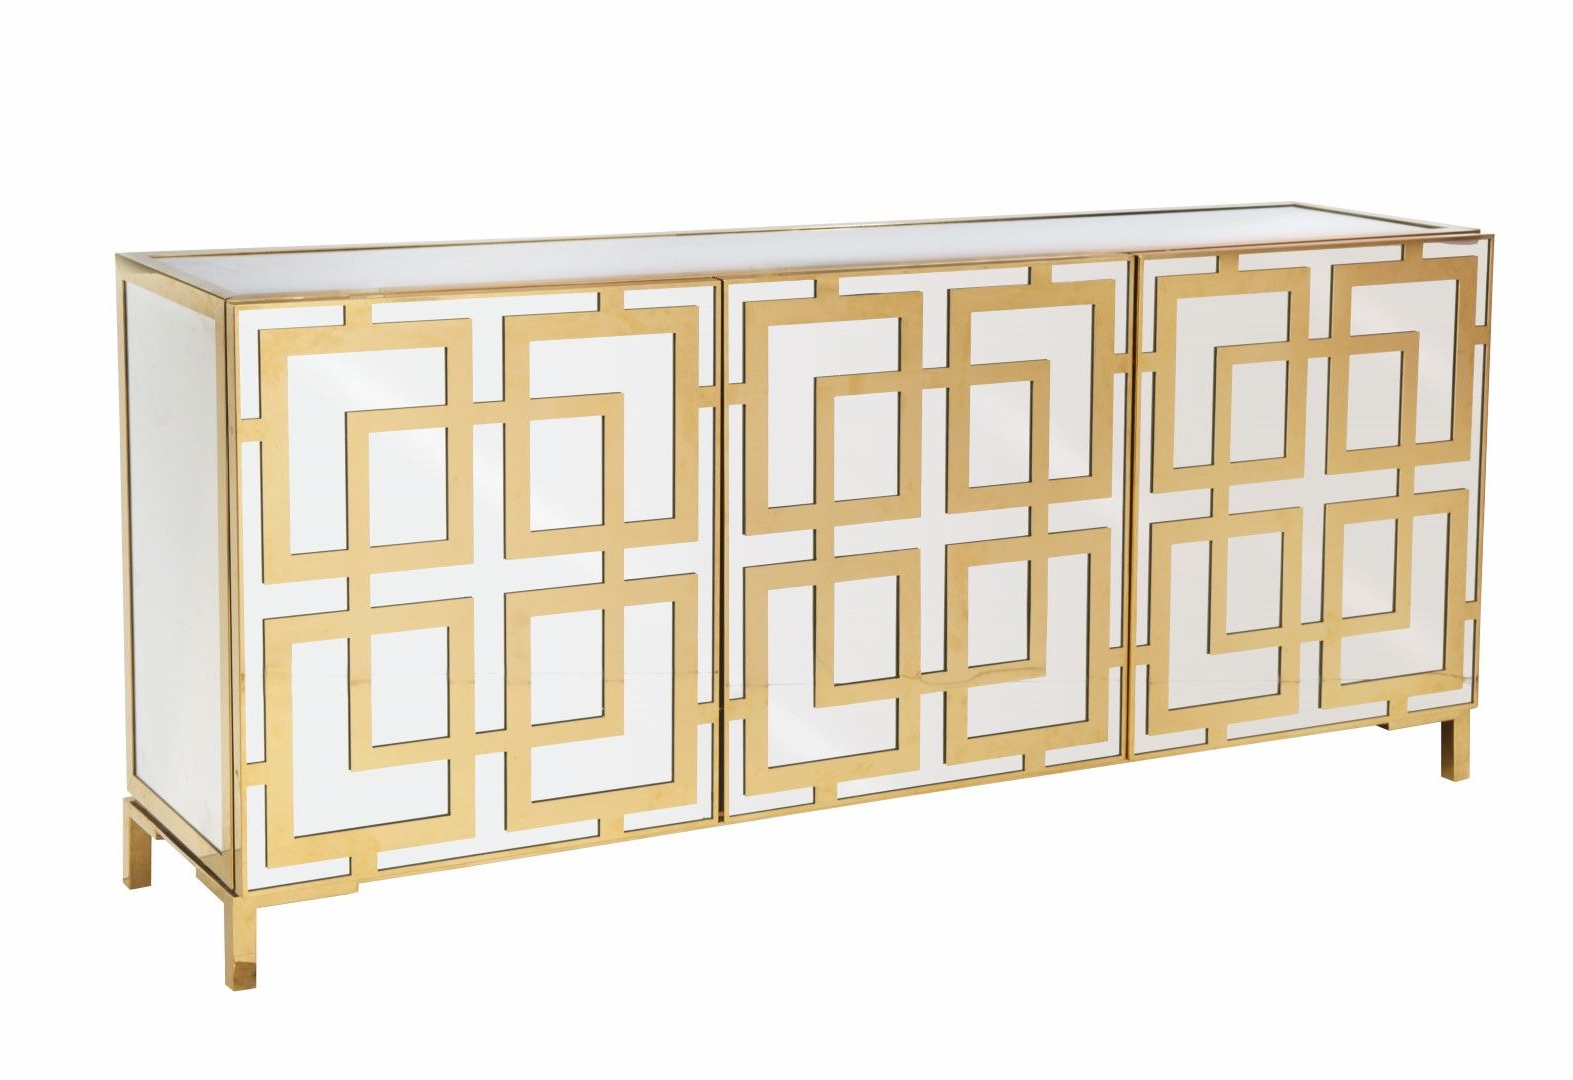 Pincreative Furniture Galleries On Sideboards | Buffet Throughout Wattisham Sideboards (View 13 of 20)